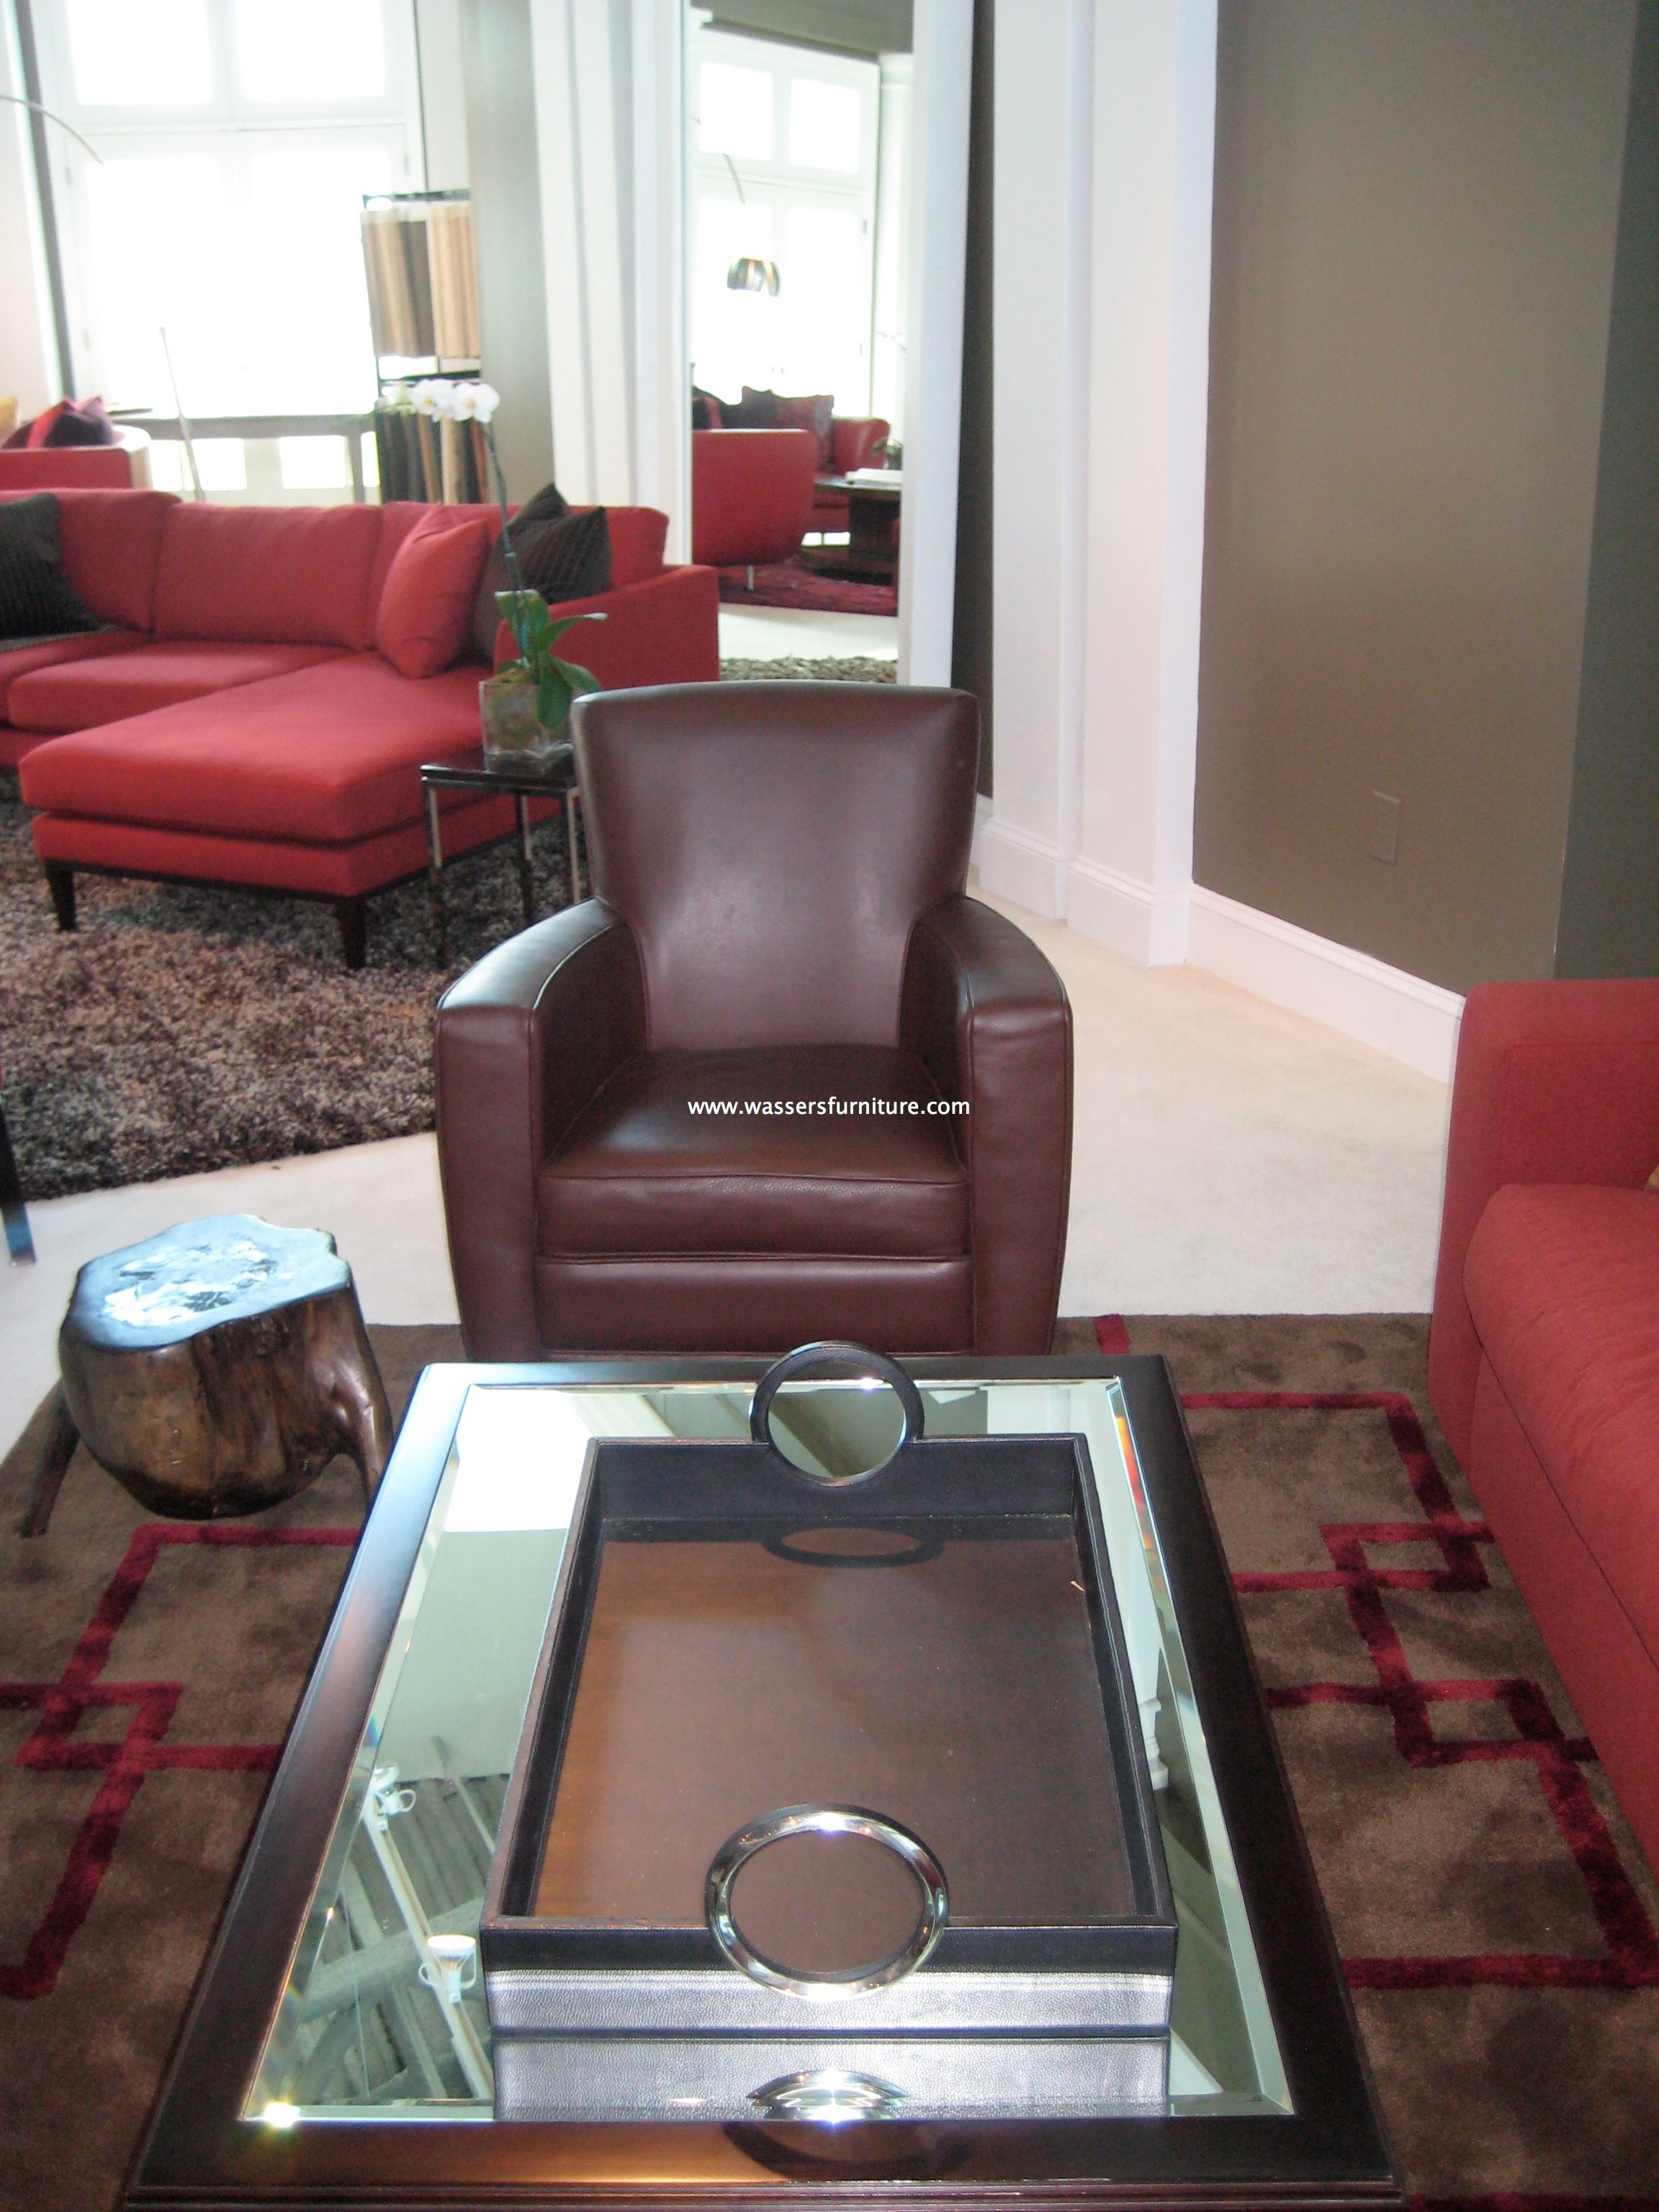 Etonnant Wassers Furniture. Modern Contemporary Furniture Showroom And Interior  Design Studio, Hallandale Beach/Aventura